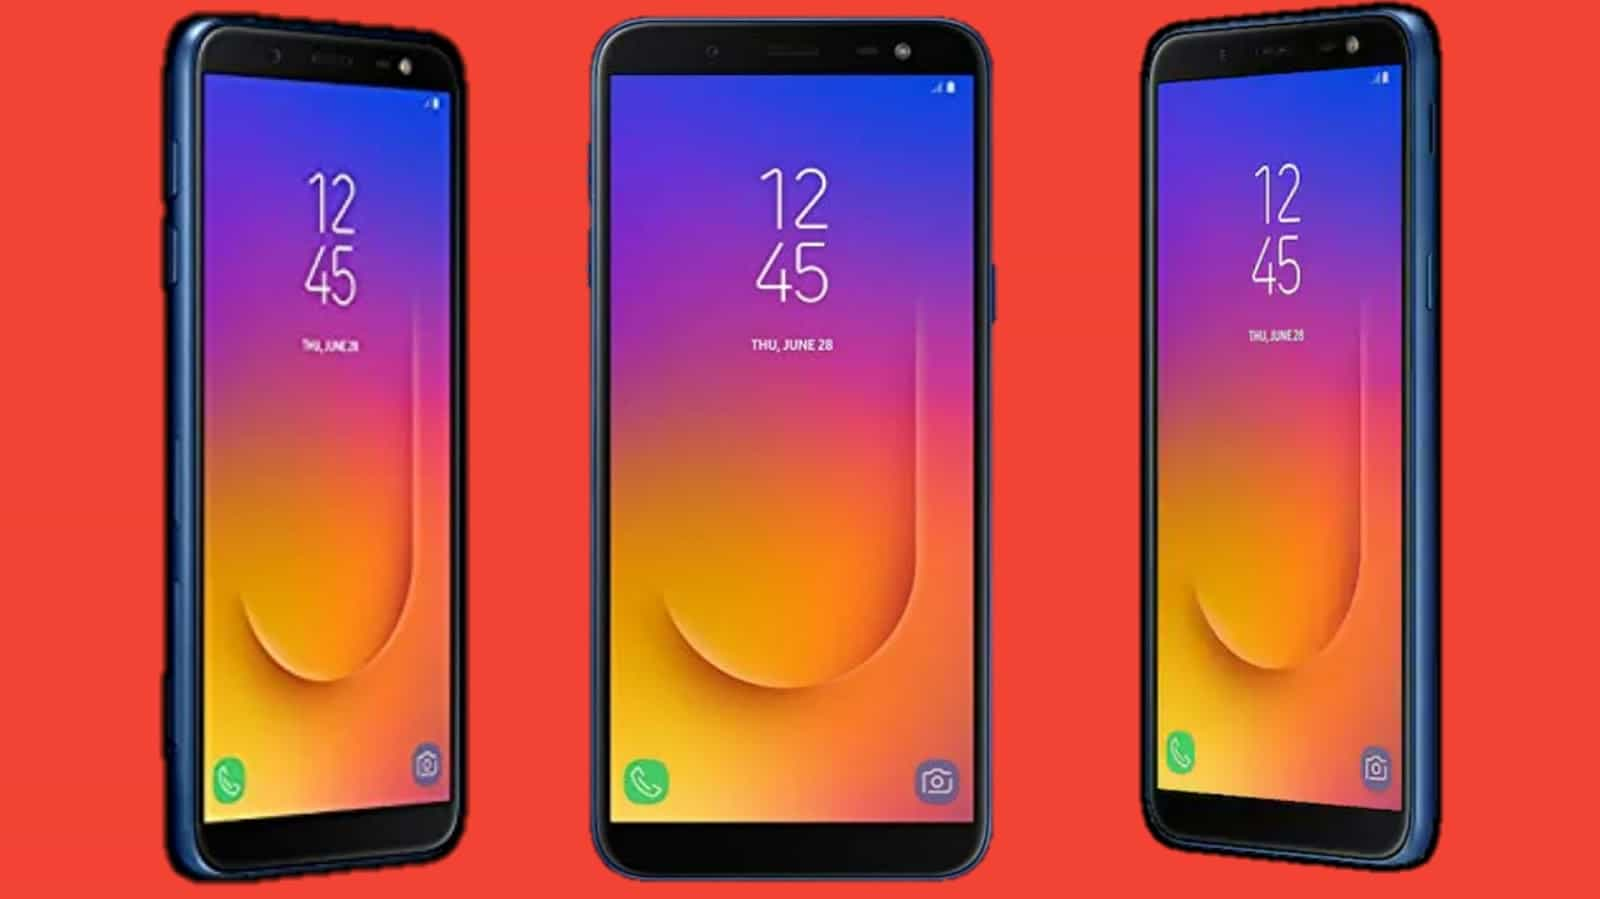 Samsung Galaxy J6 to get Android Pie update